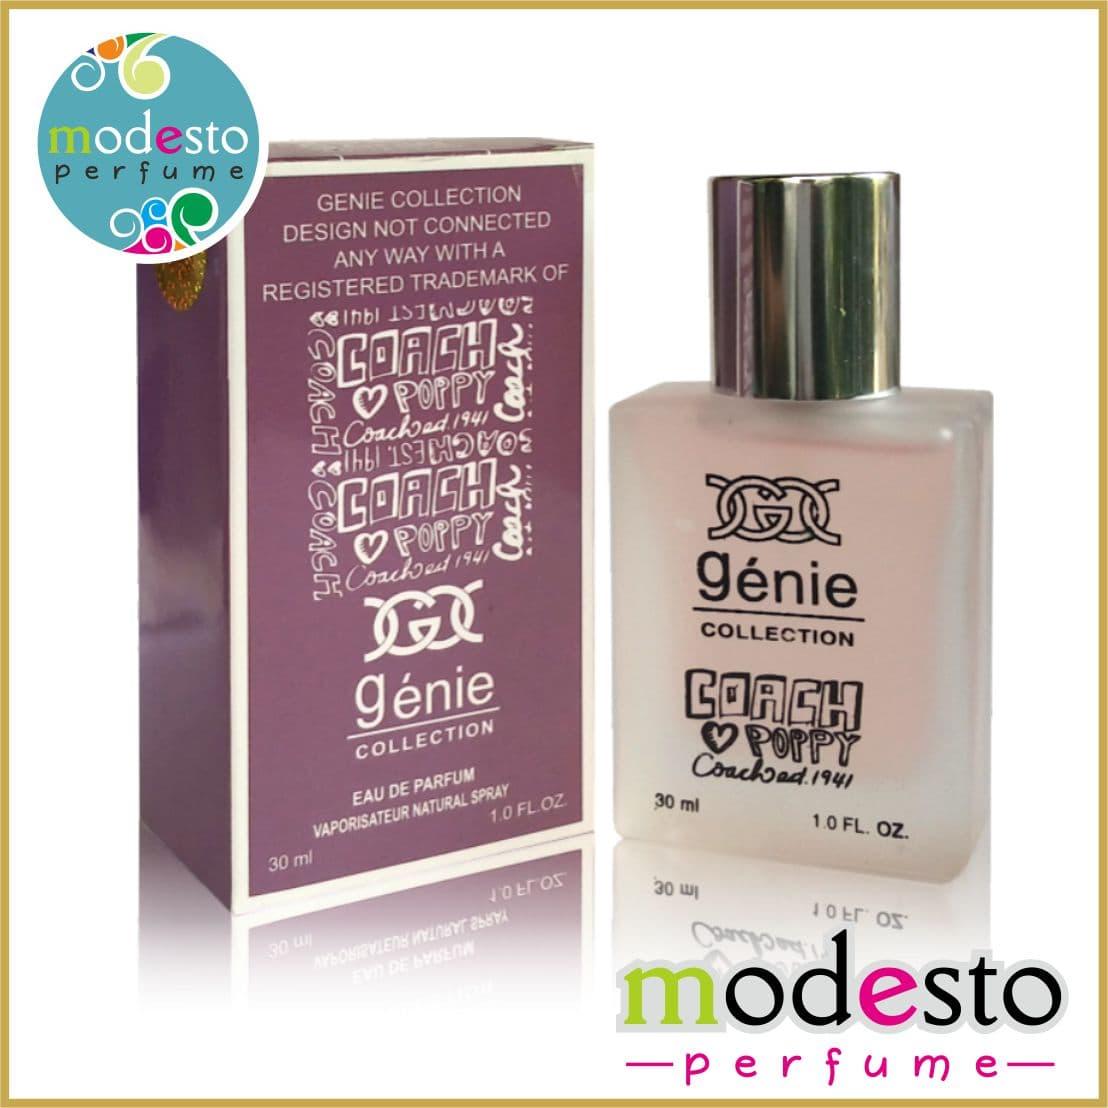 Jual Original Perfume KrasaVa Coach Poppy - Modesto Perfume ... 7dea2d9e5d